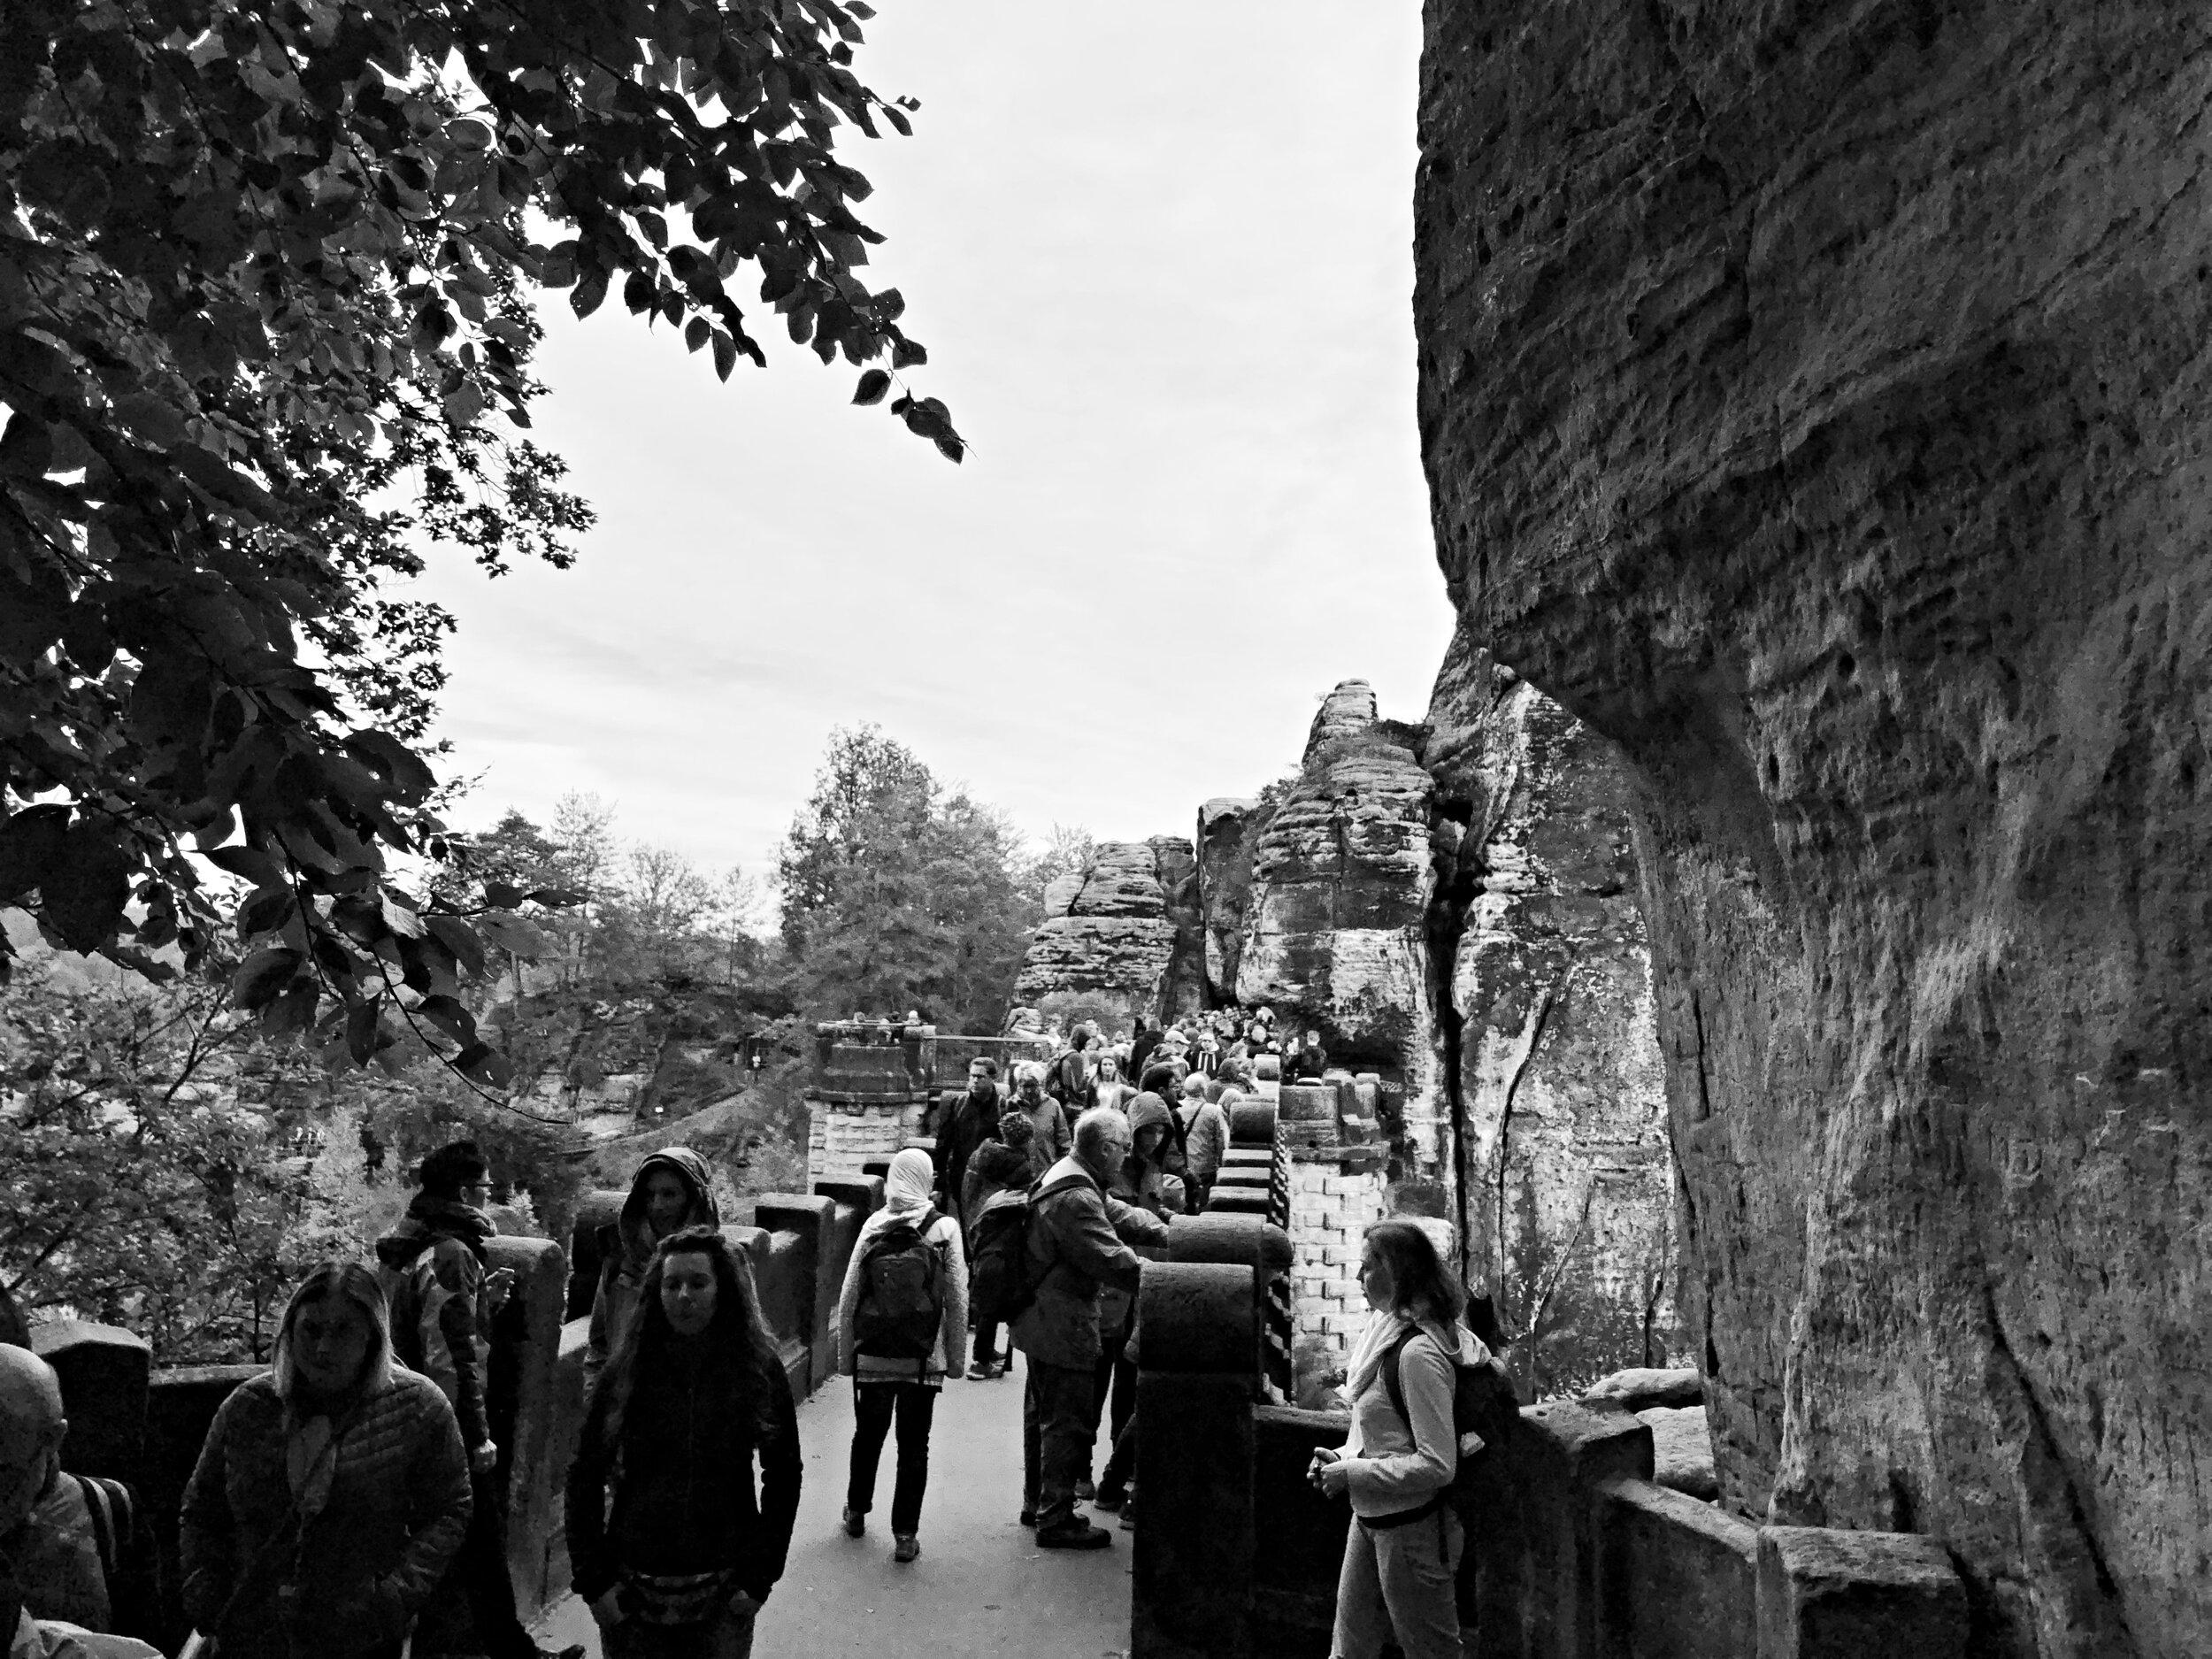 baste-bridge-lohmen-germany-hiking_0315.JPG